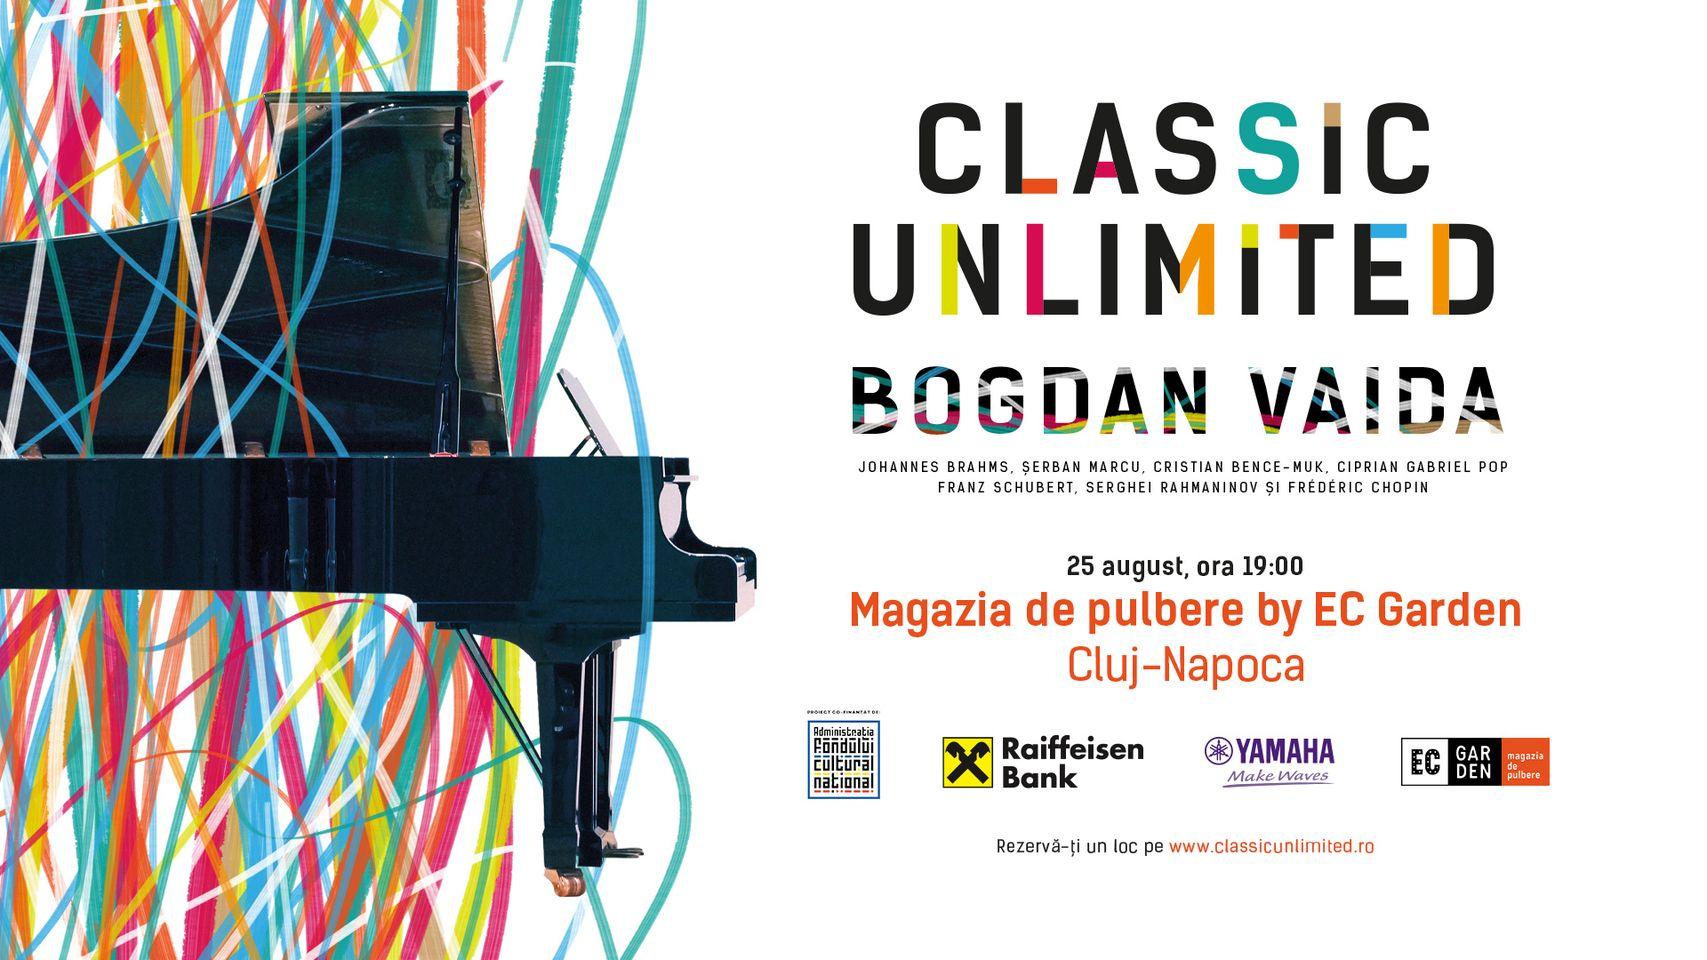 Classic Unlimited - Magazia de pulbere by EC Garden